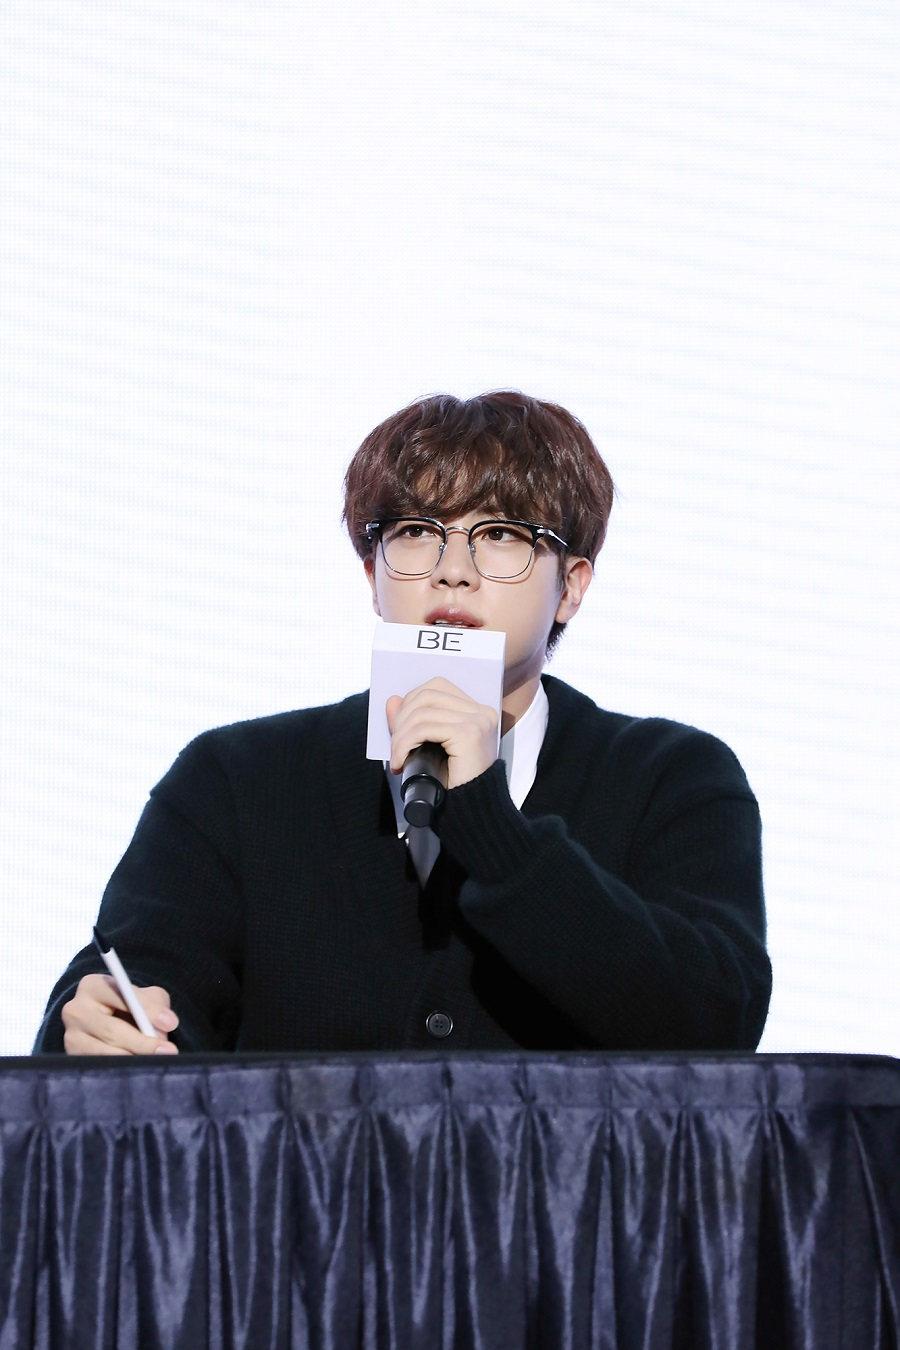 BTS 'BE' 発売グローバル記者懇談会_JIN